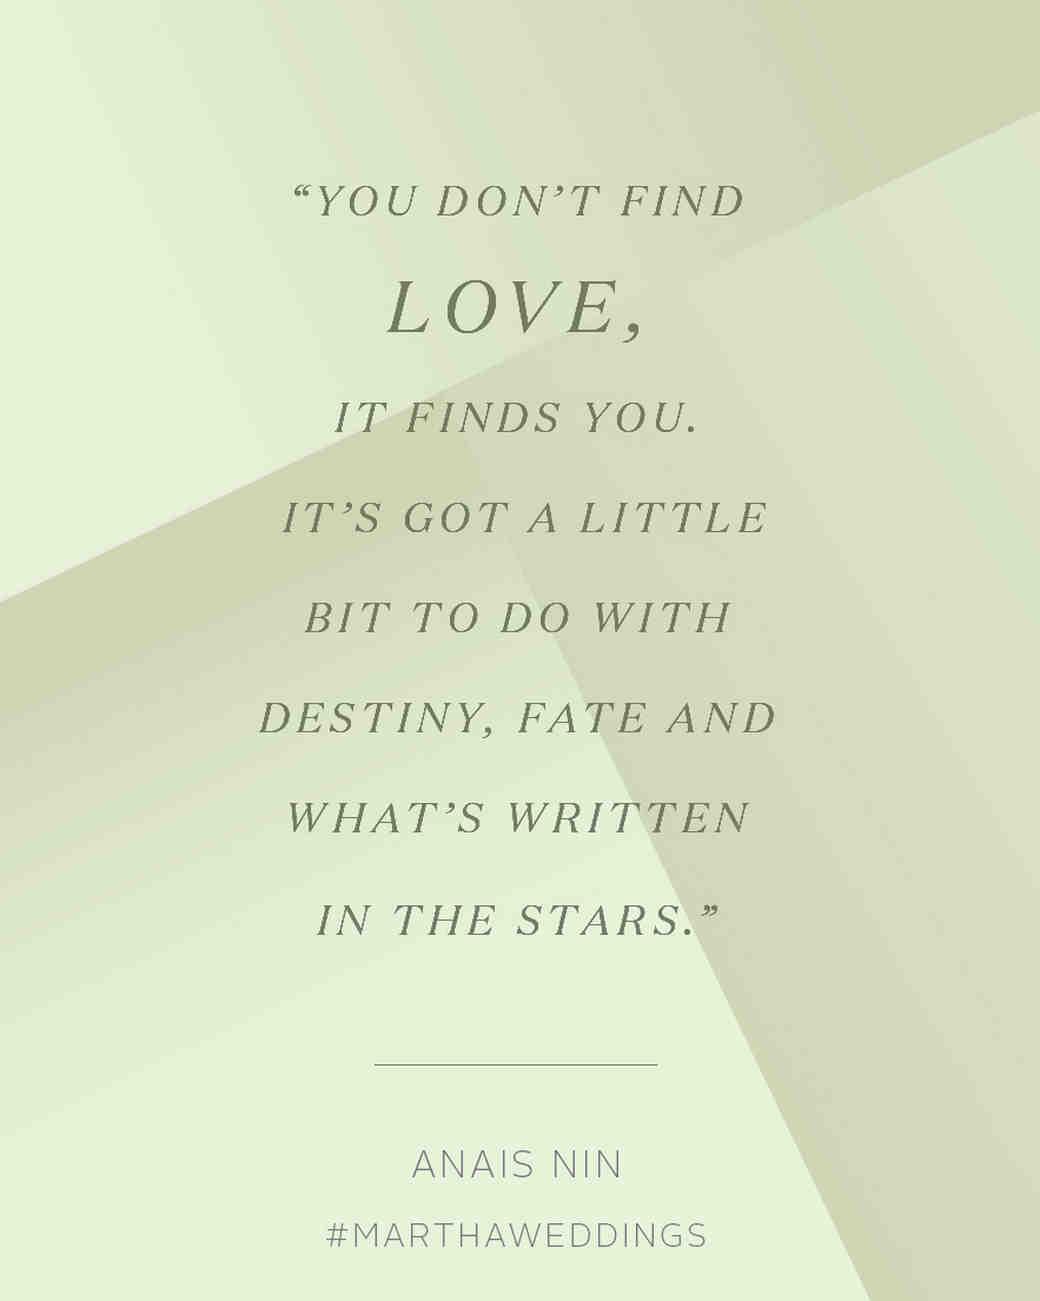 love-quotes-anais-nin-written-in-the-stars-1015.jpg